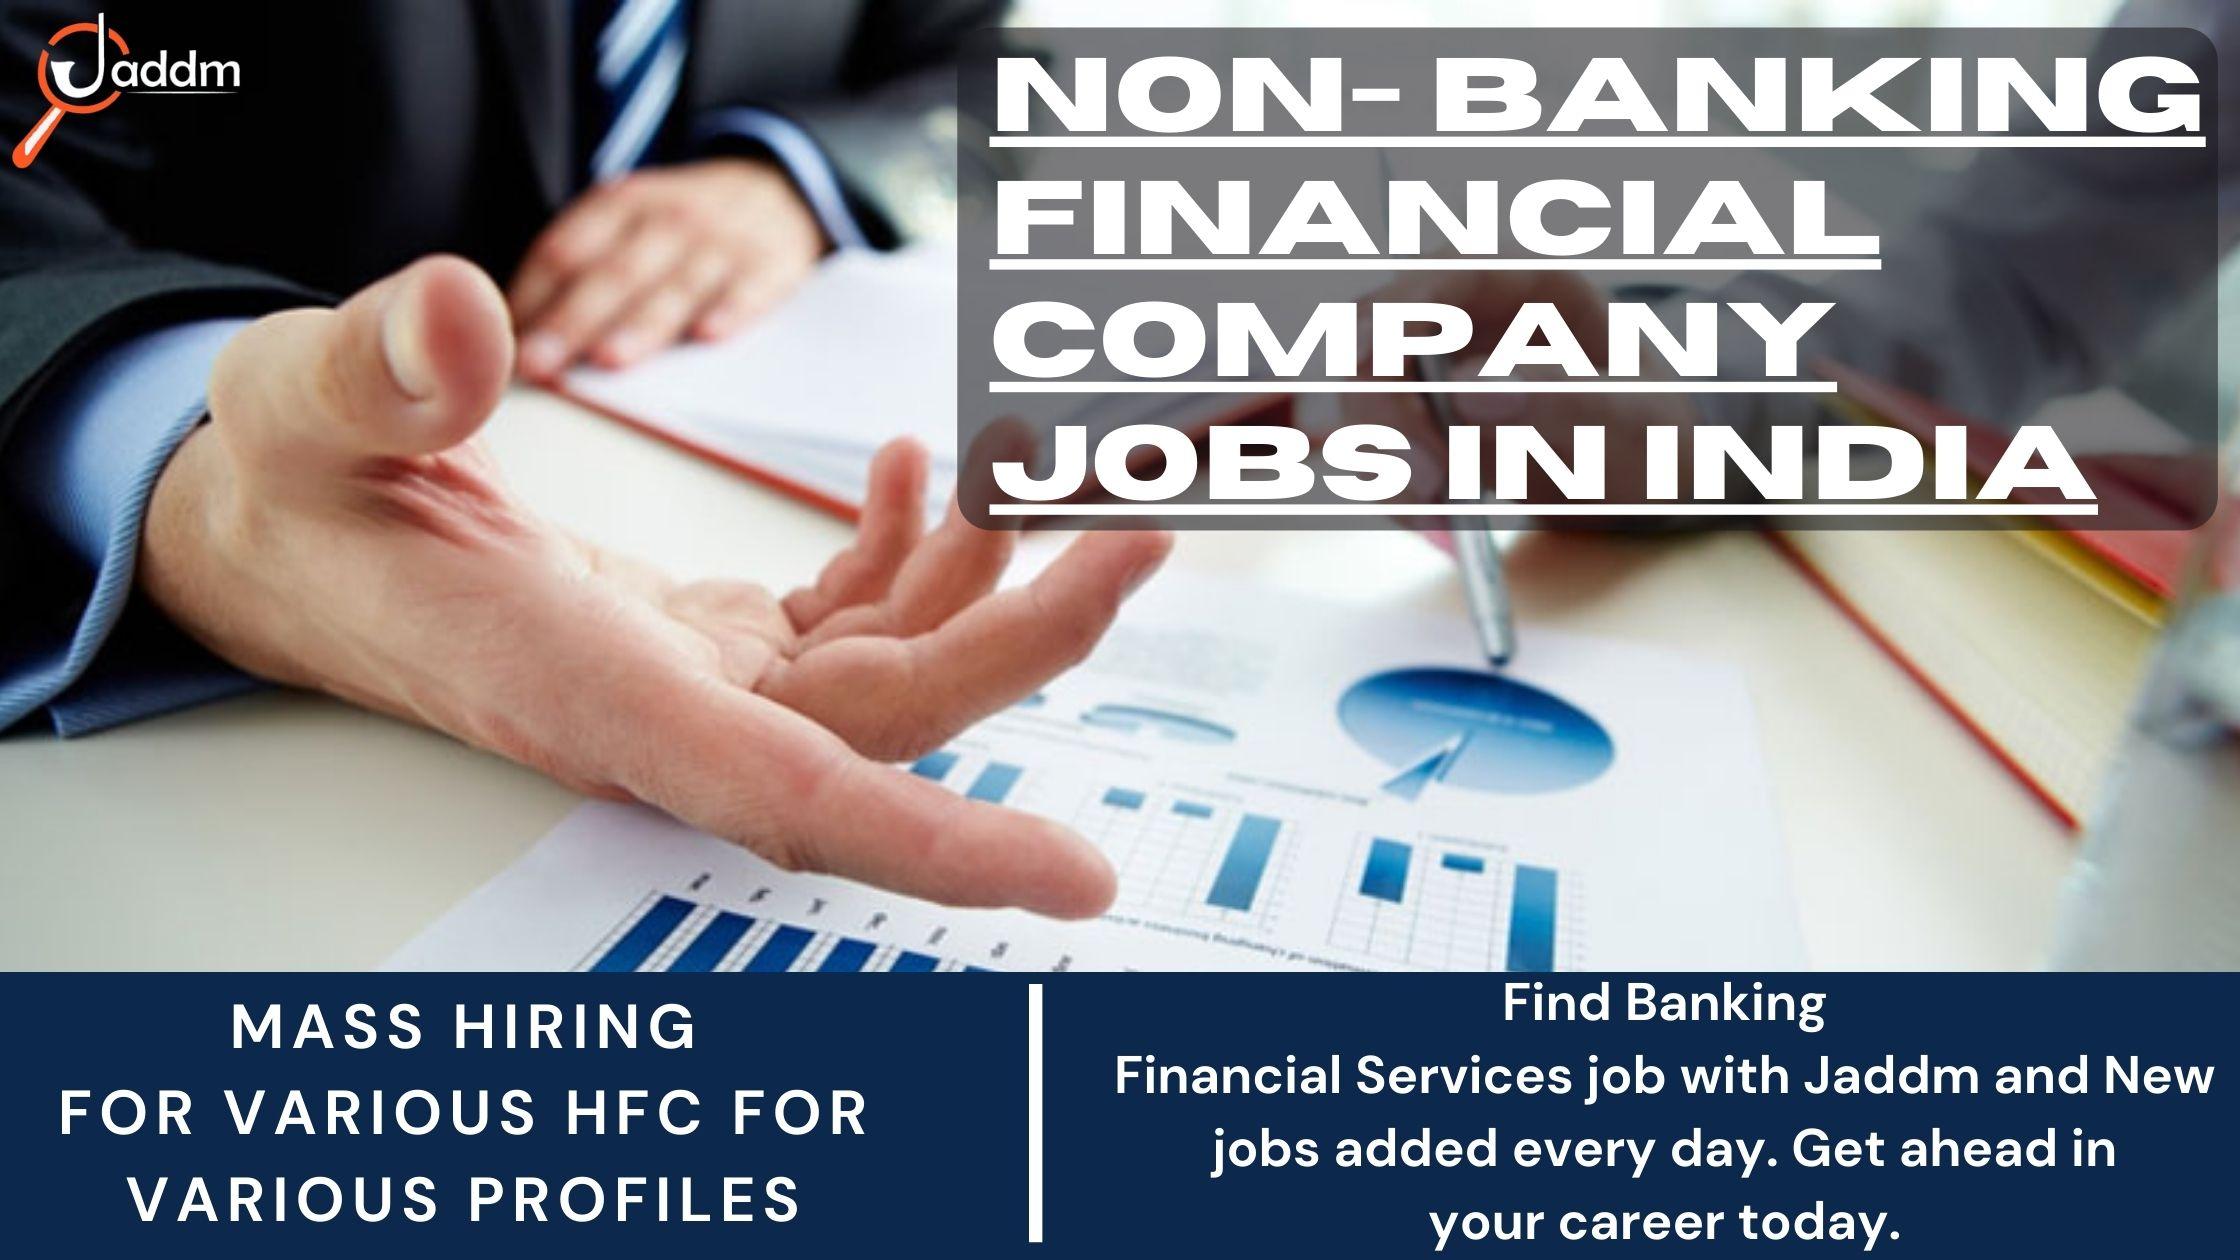 Non Banking Finance Company Job in India, Jaddm Recruitment